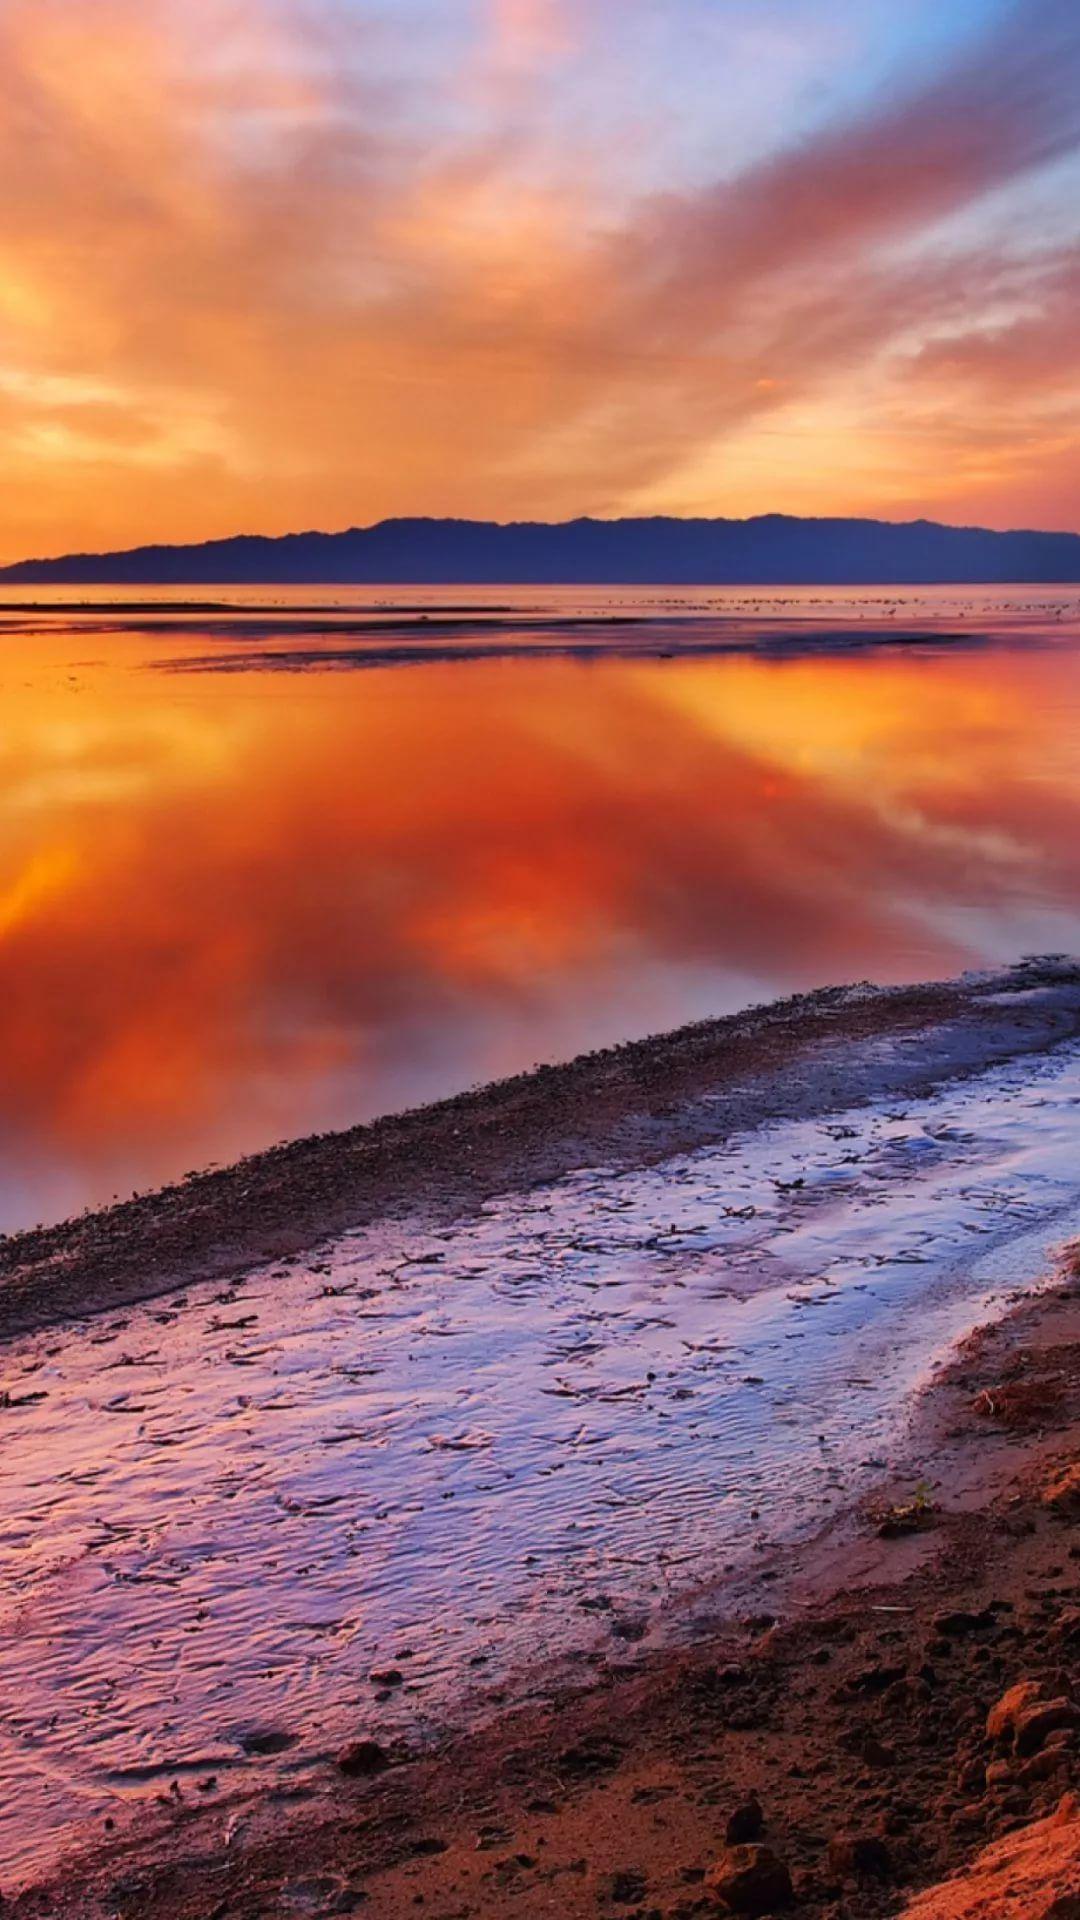 Beautiful Sunset Apple iPhone wallpaper